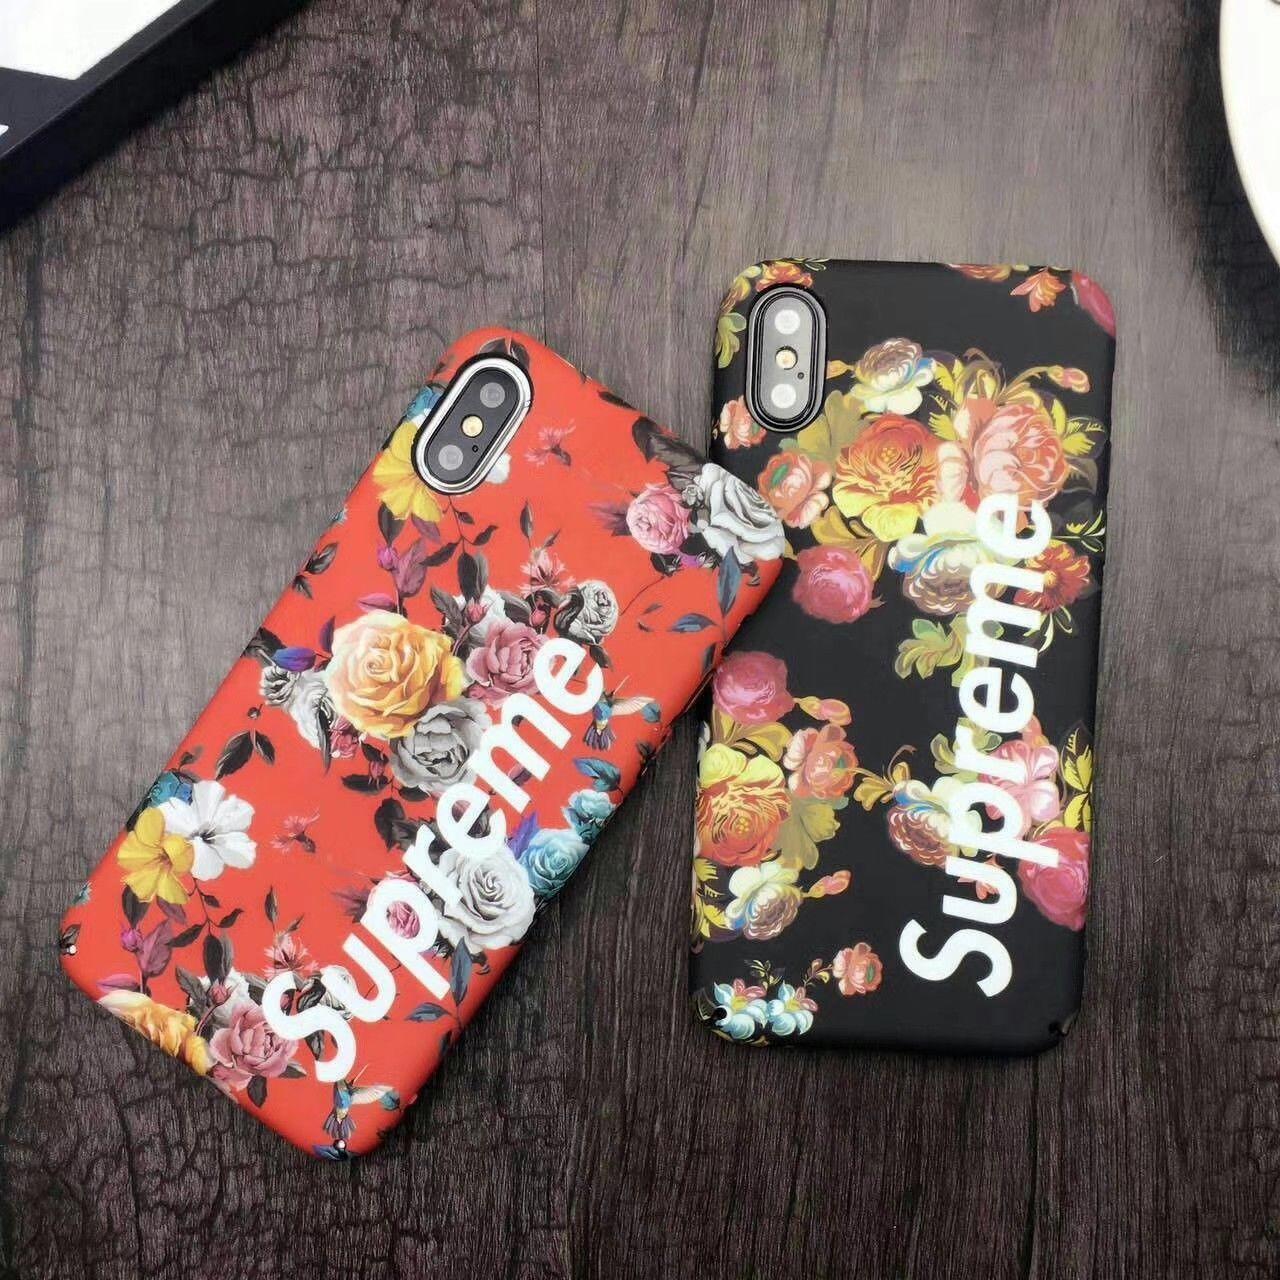 2017 Supreme Luminous Hp Case Cover For Iphone 8 8 Plus X